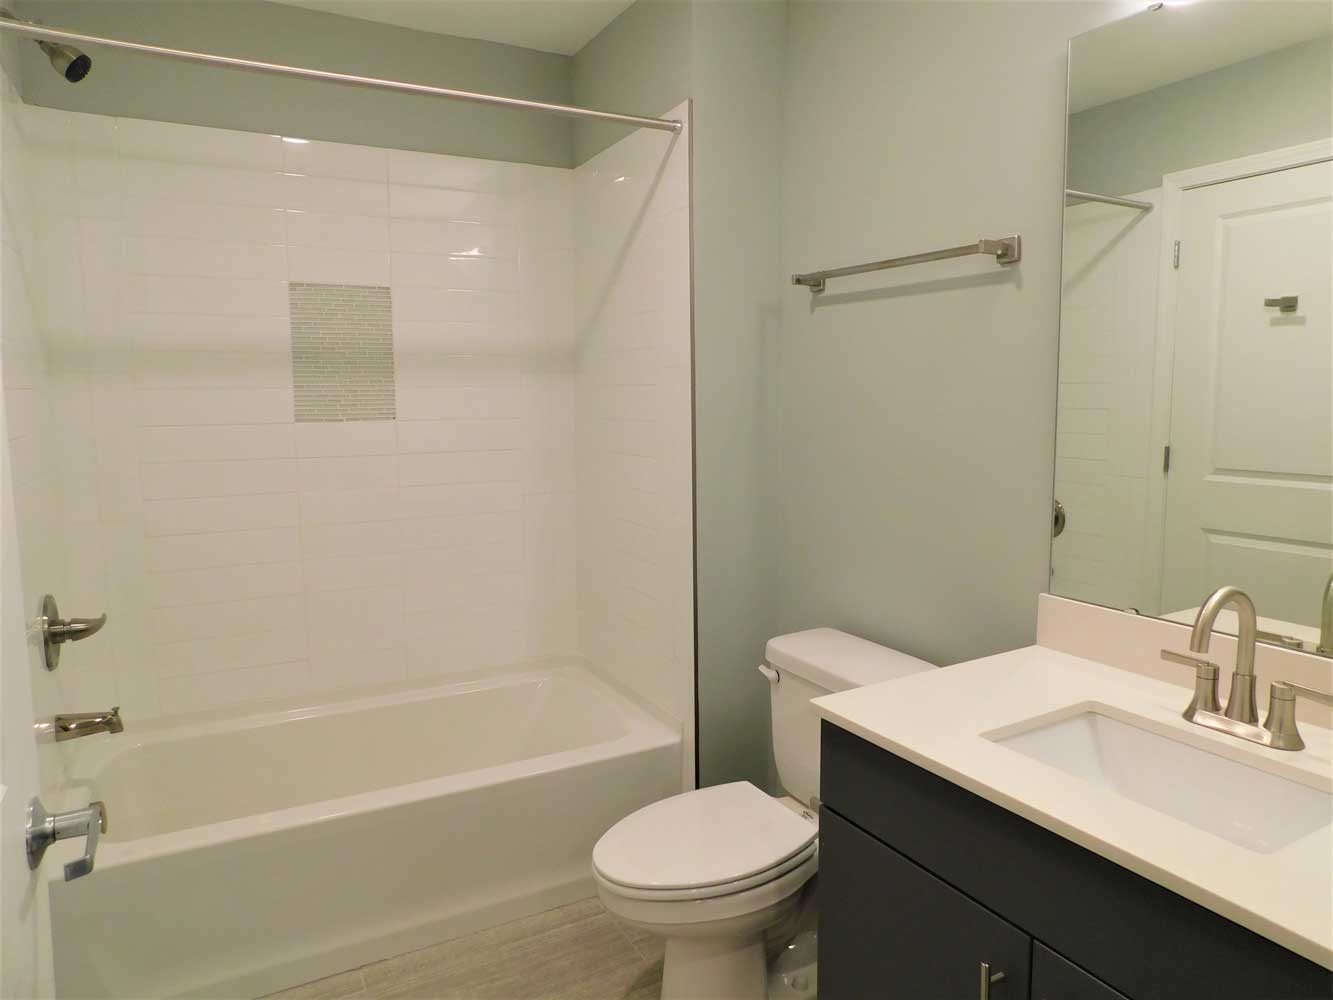 Bathroom at Midtown Plaza Apartments in Kansas City, MO